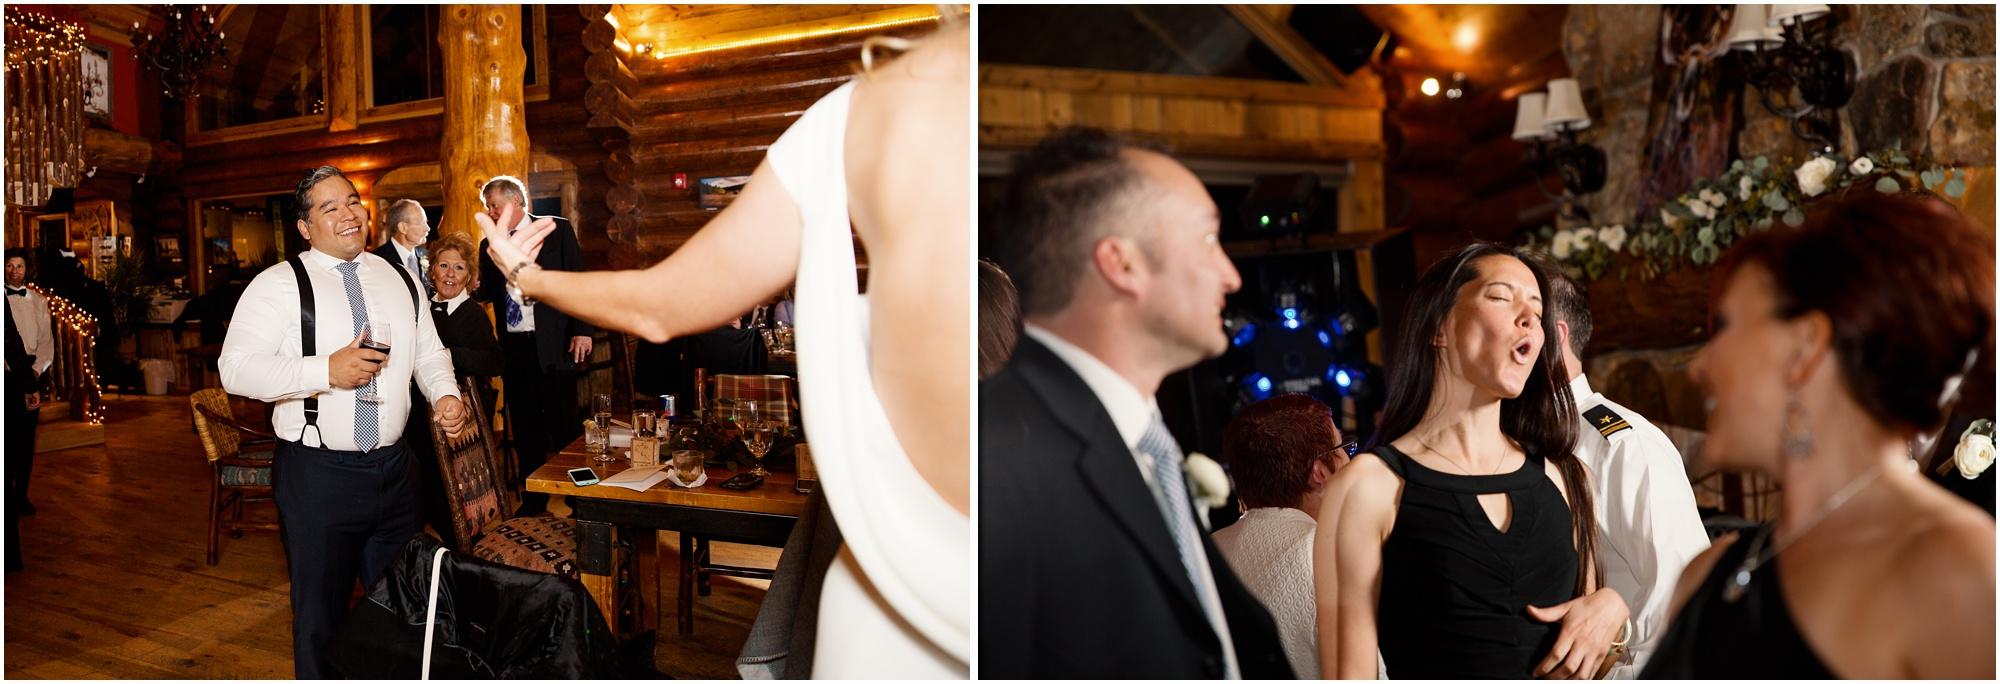 Breckenridge-Wedding-Photographer_0067.jpg